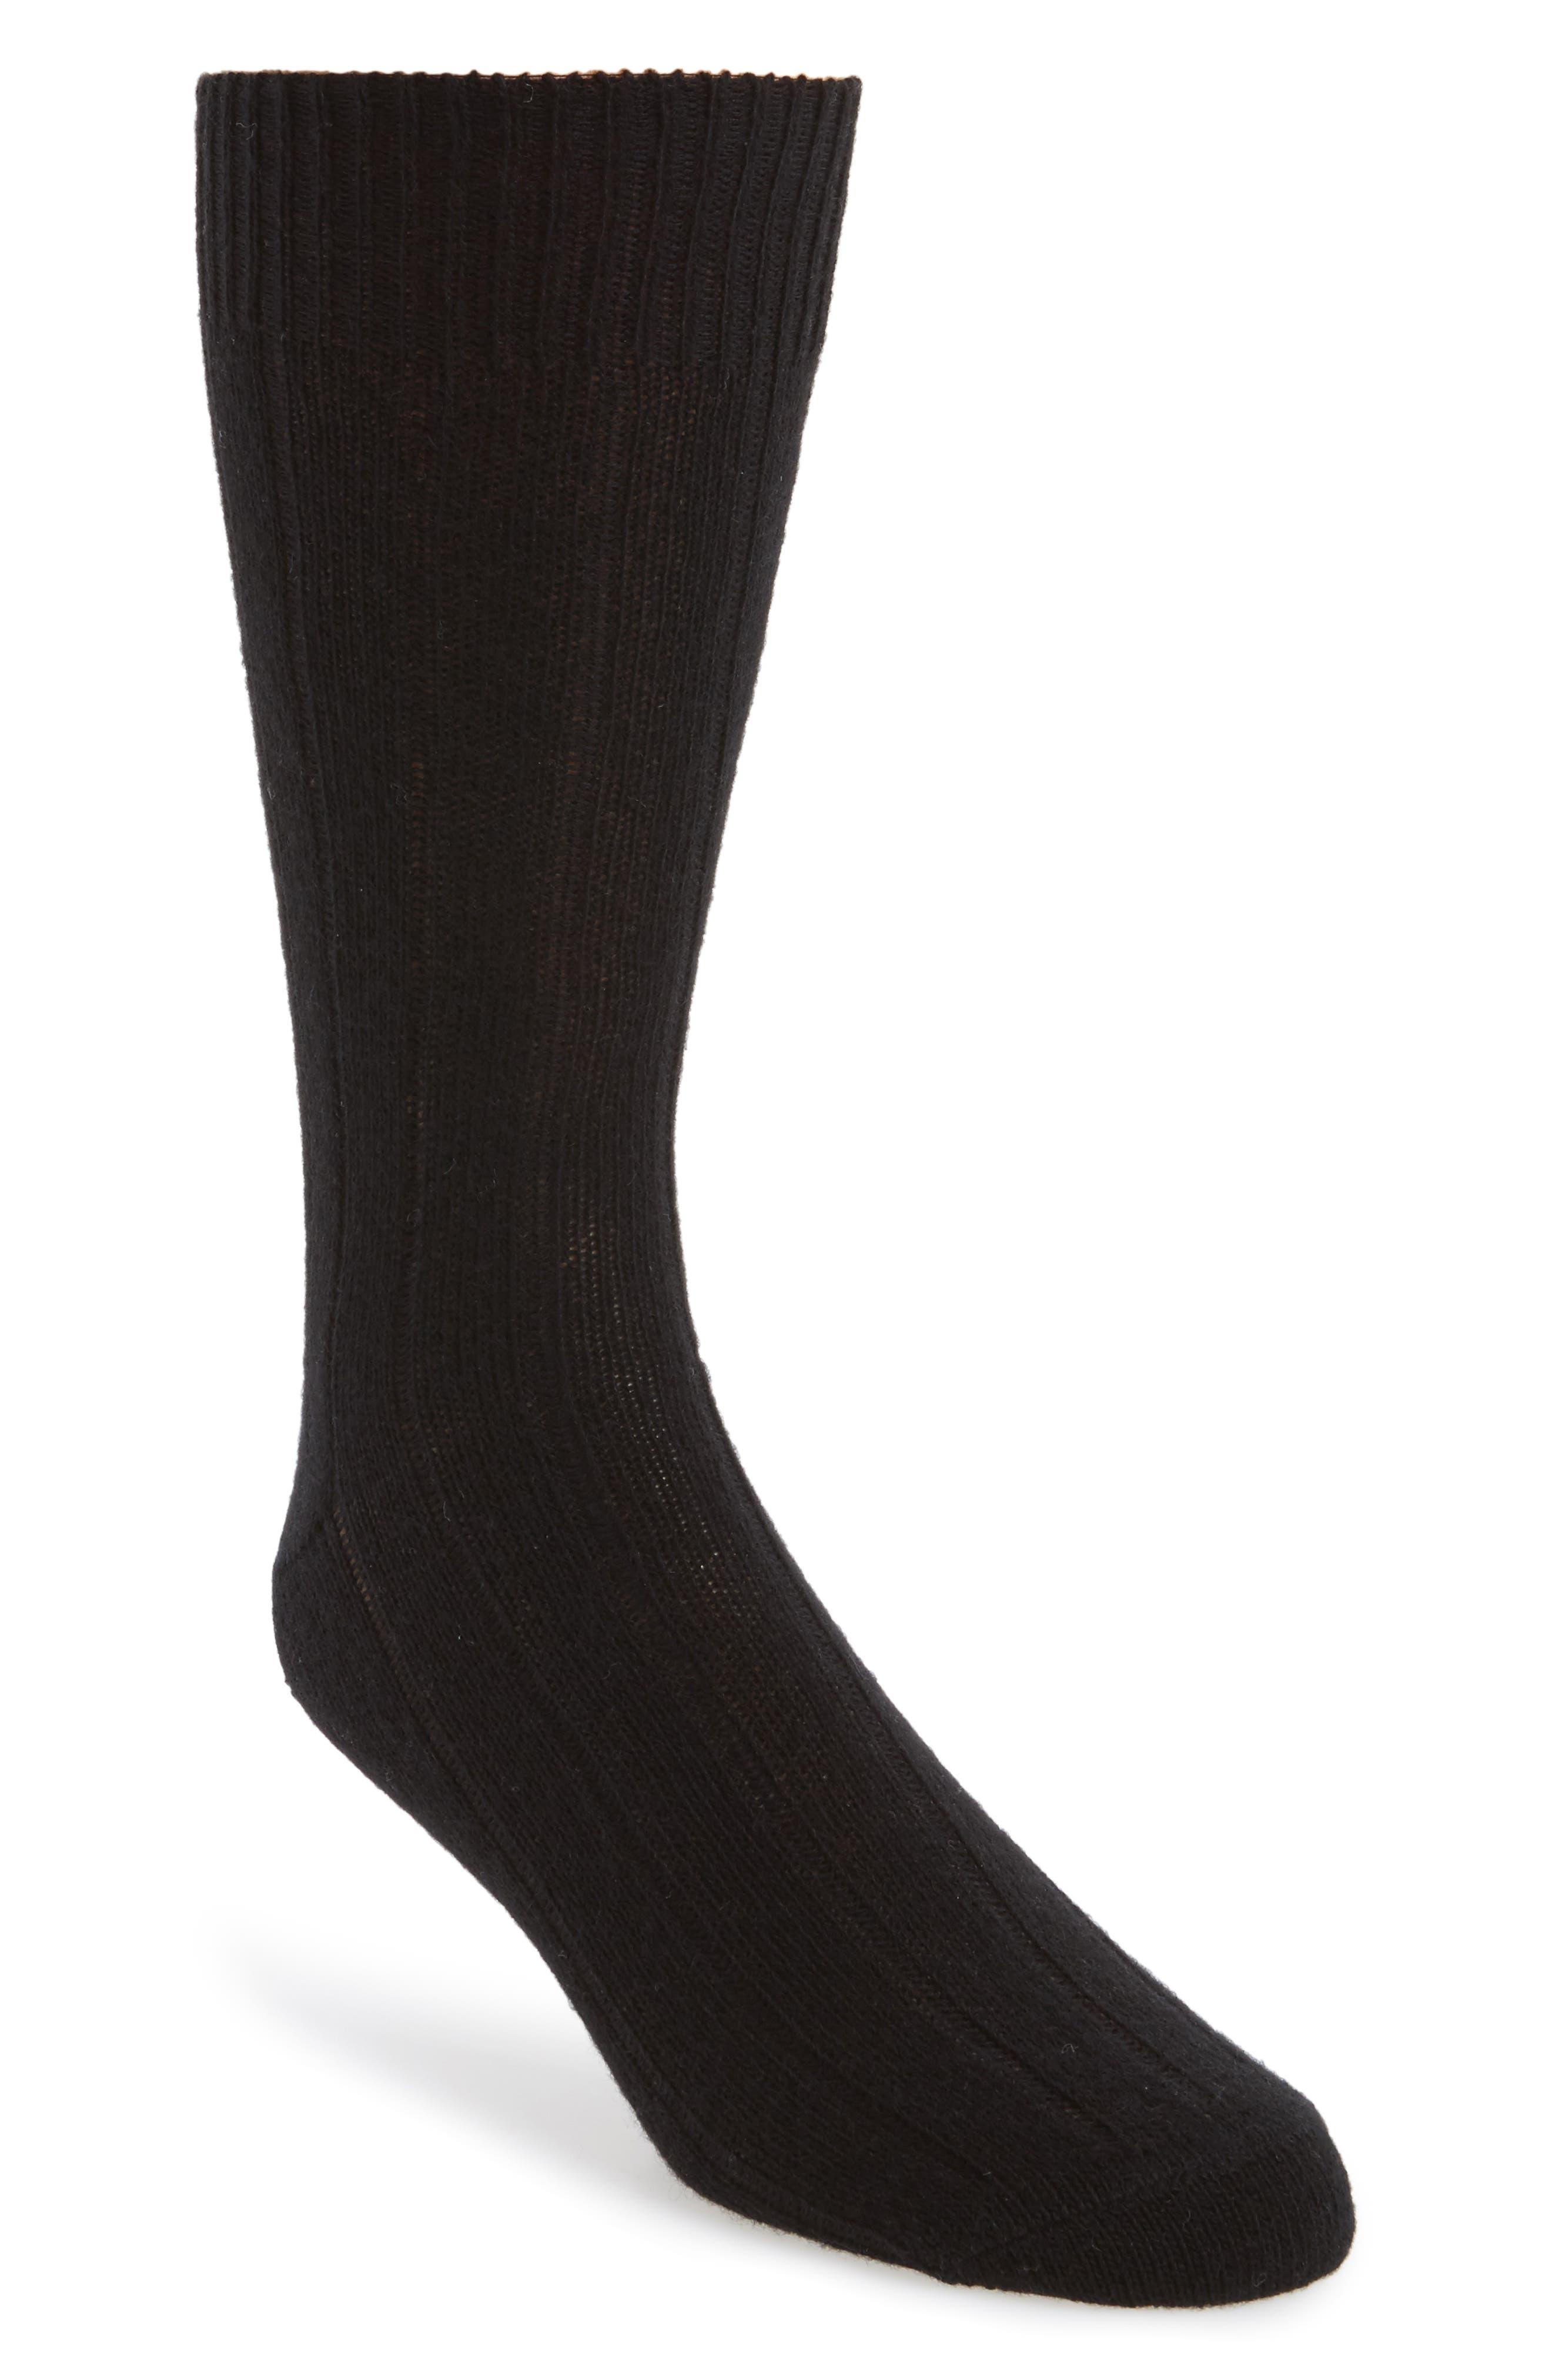 Cashmere Blend Socks,                             Main thumbnail 1, color,                             BLK